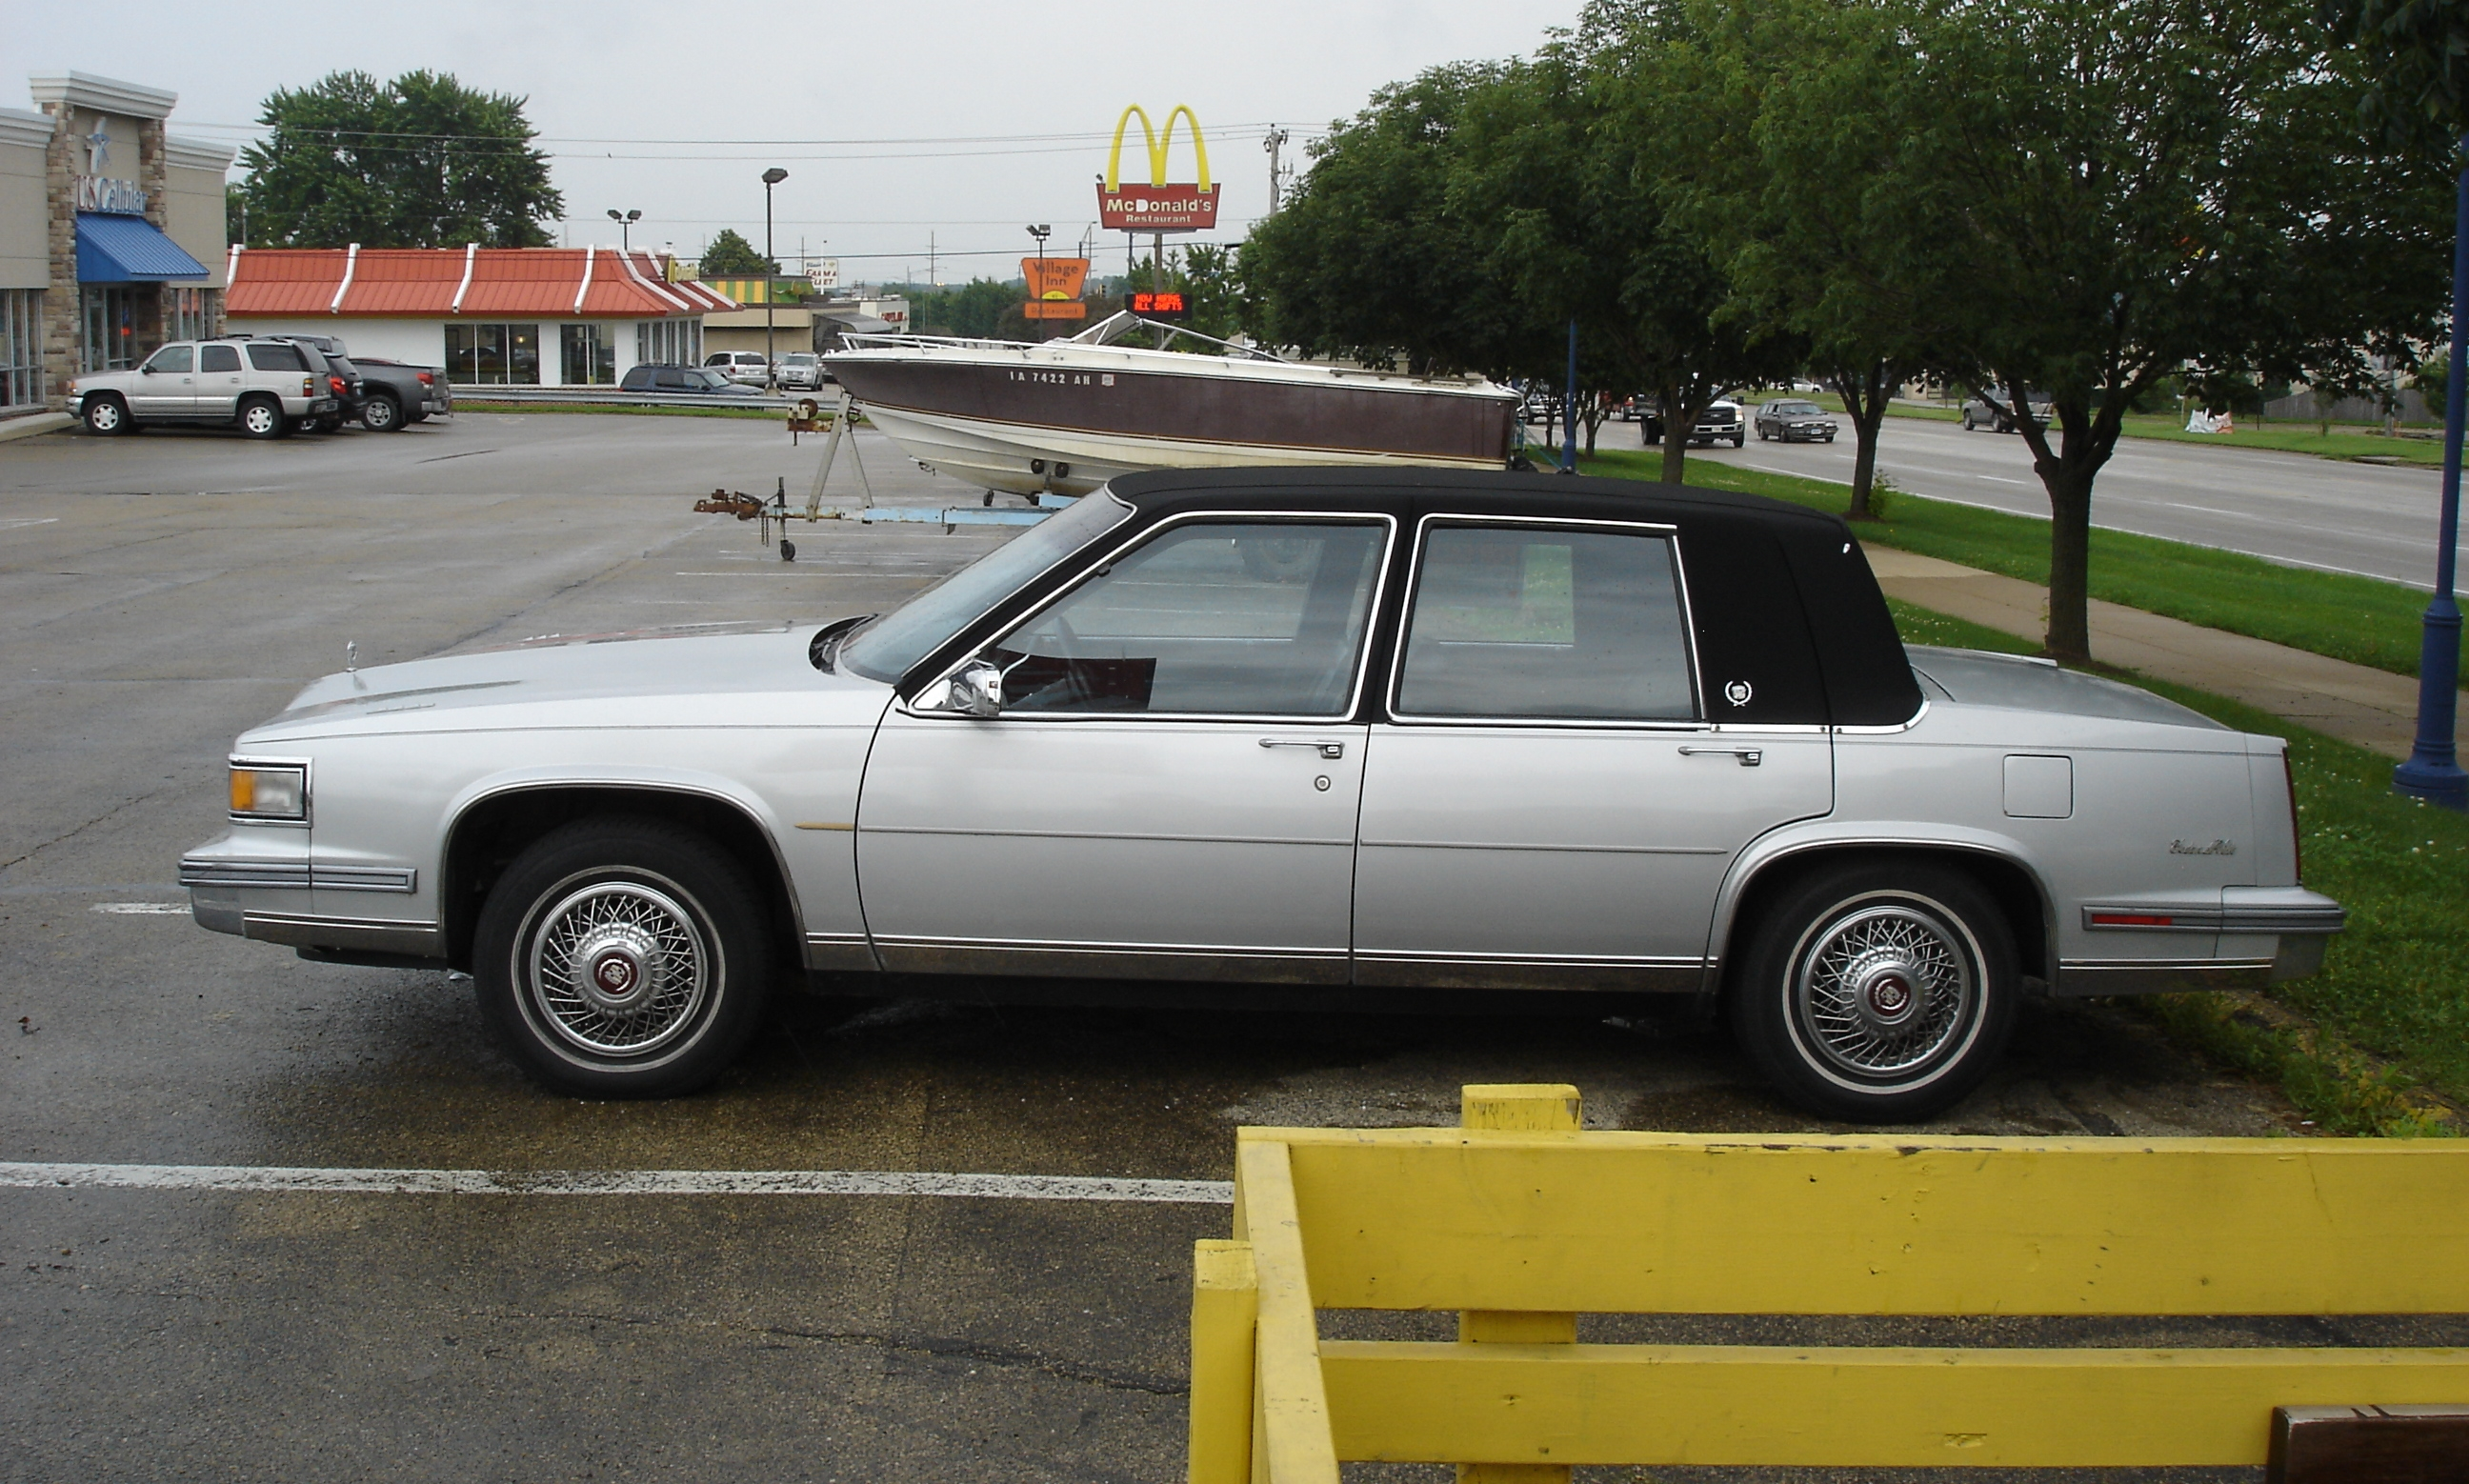 1986 Cadillac Sedan De Ville Downsizing Round Two Riverside Green 50s V8 Engine